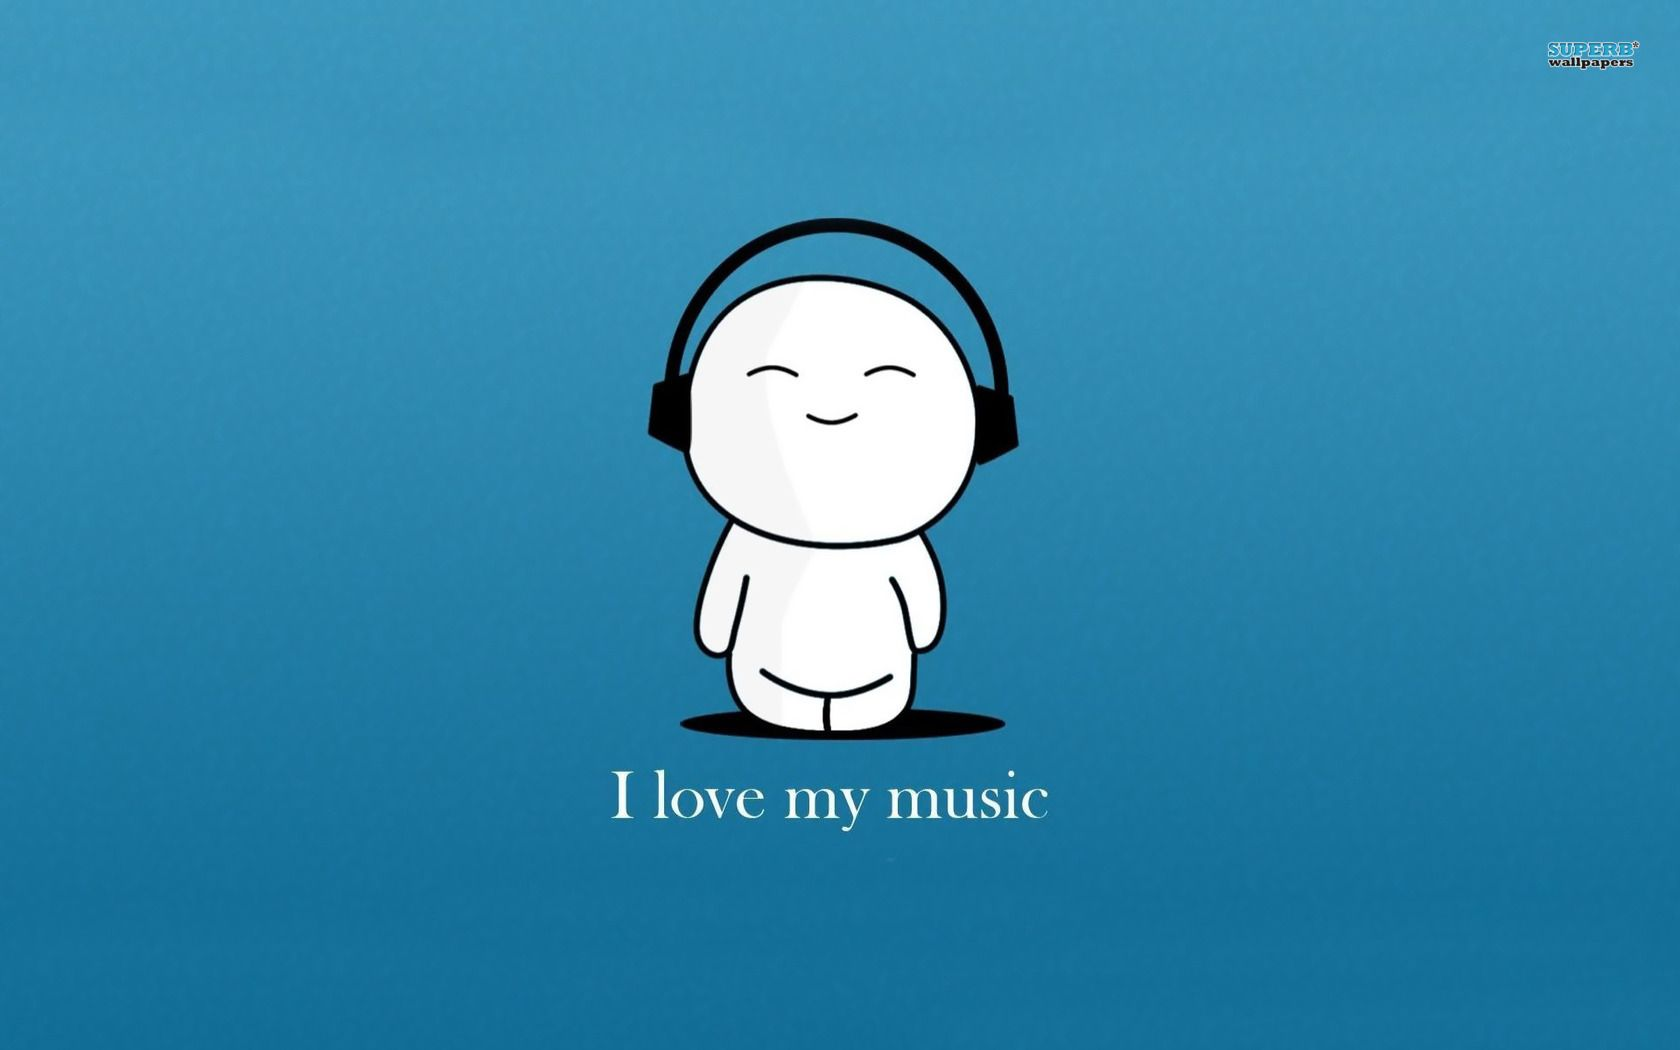 I Love Music True Xd Music Wallpaper 36556275 Fanpop Music Wallpaper Cute Cartoon Wallpapers Cartoon Wallpaper